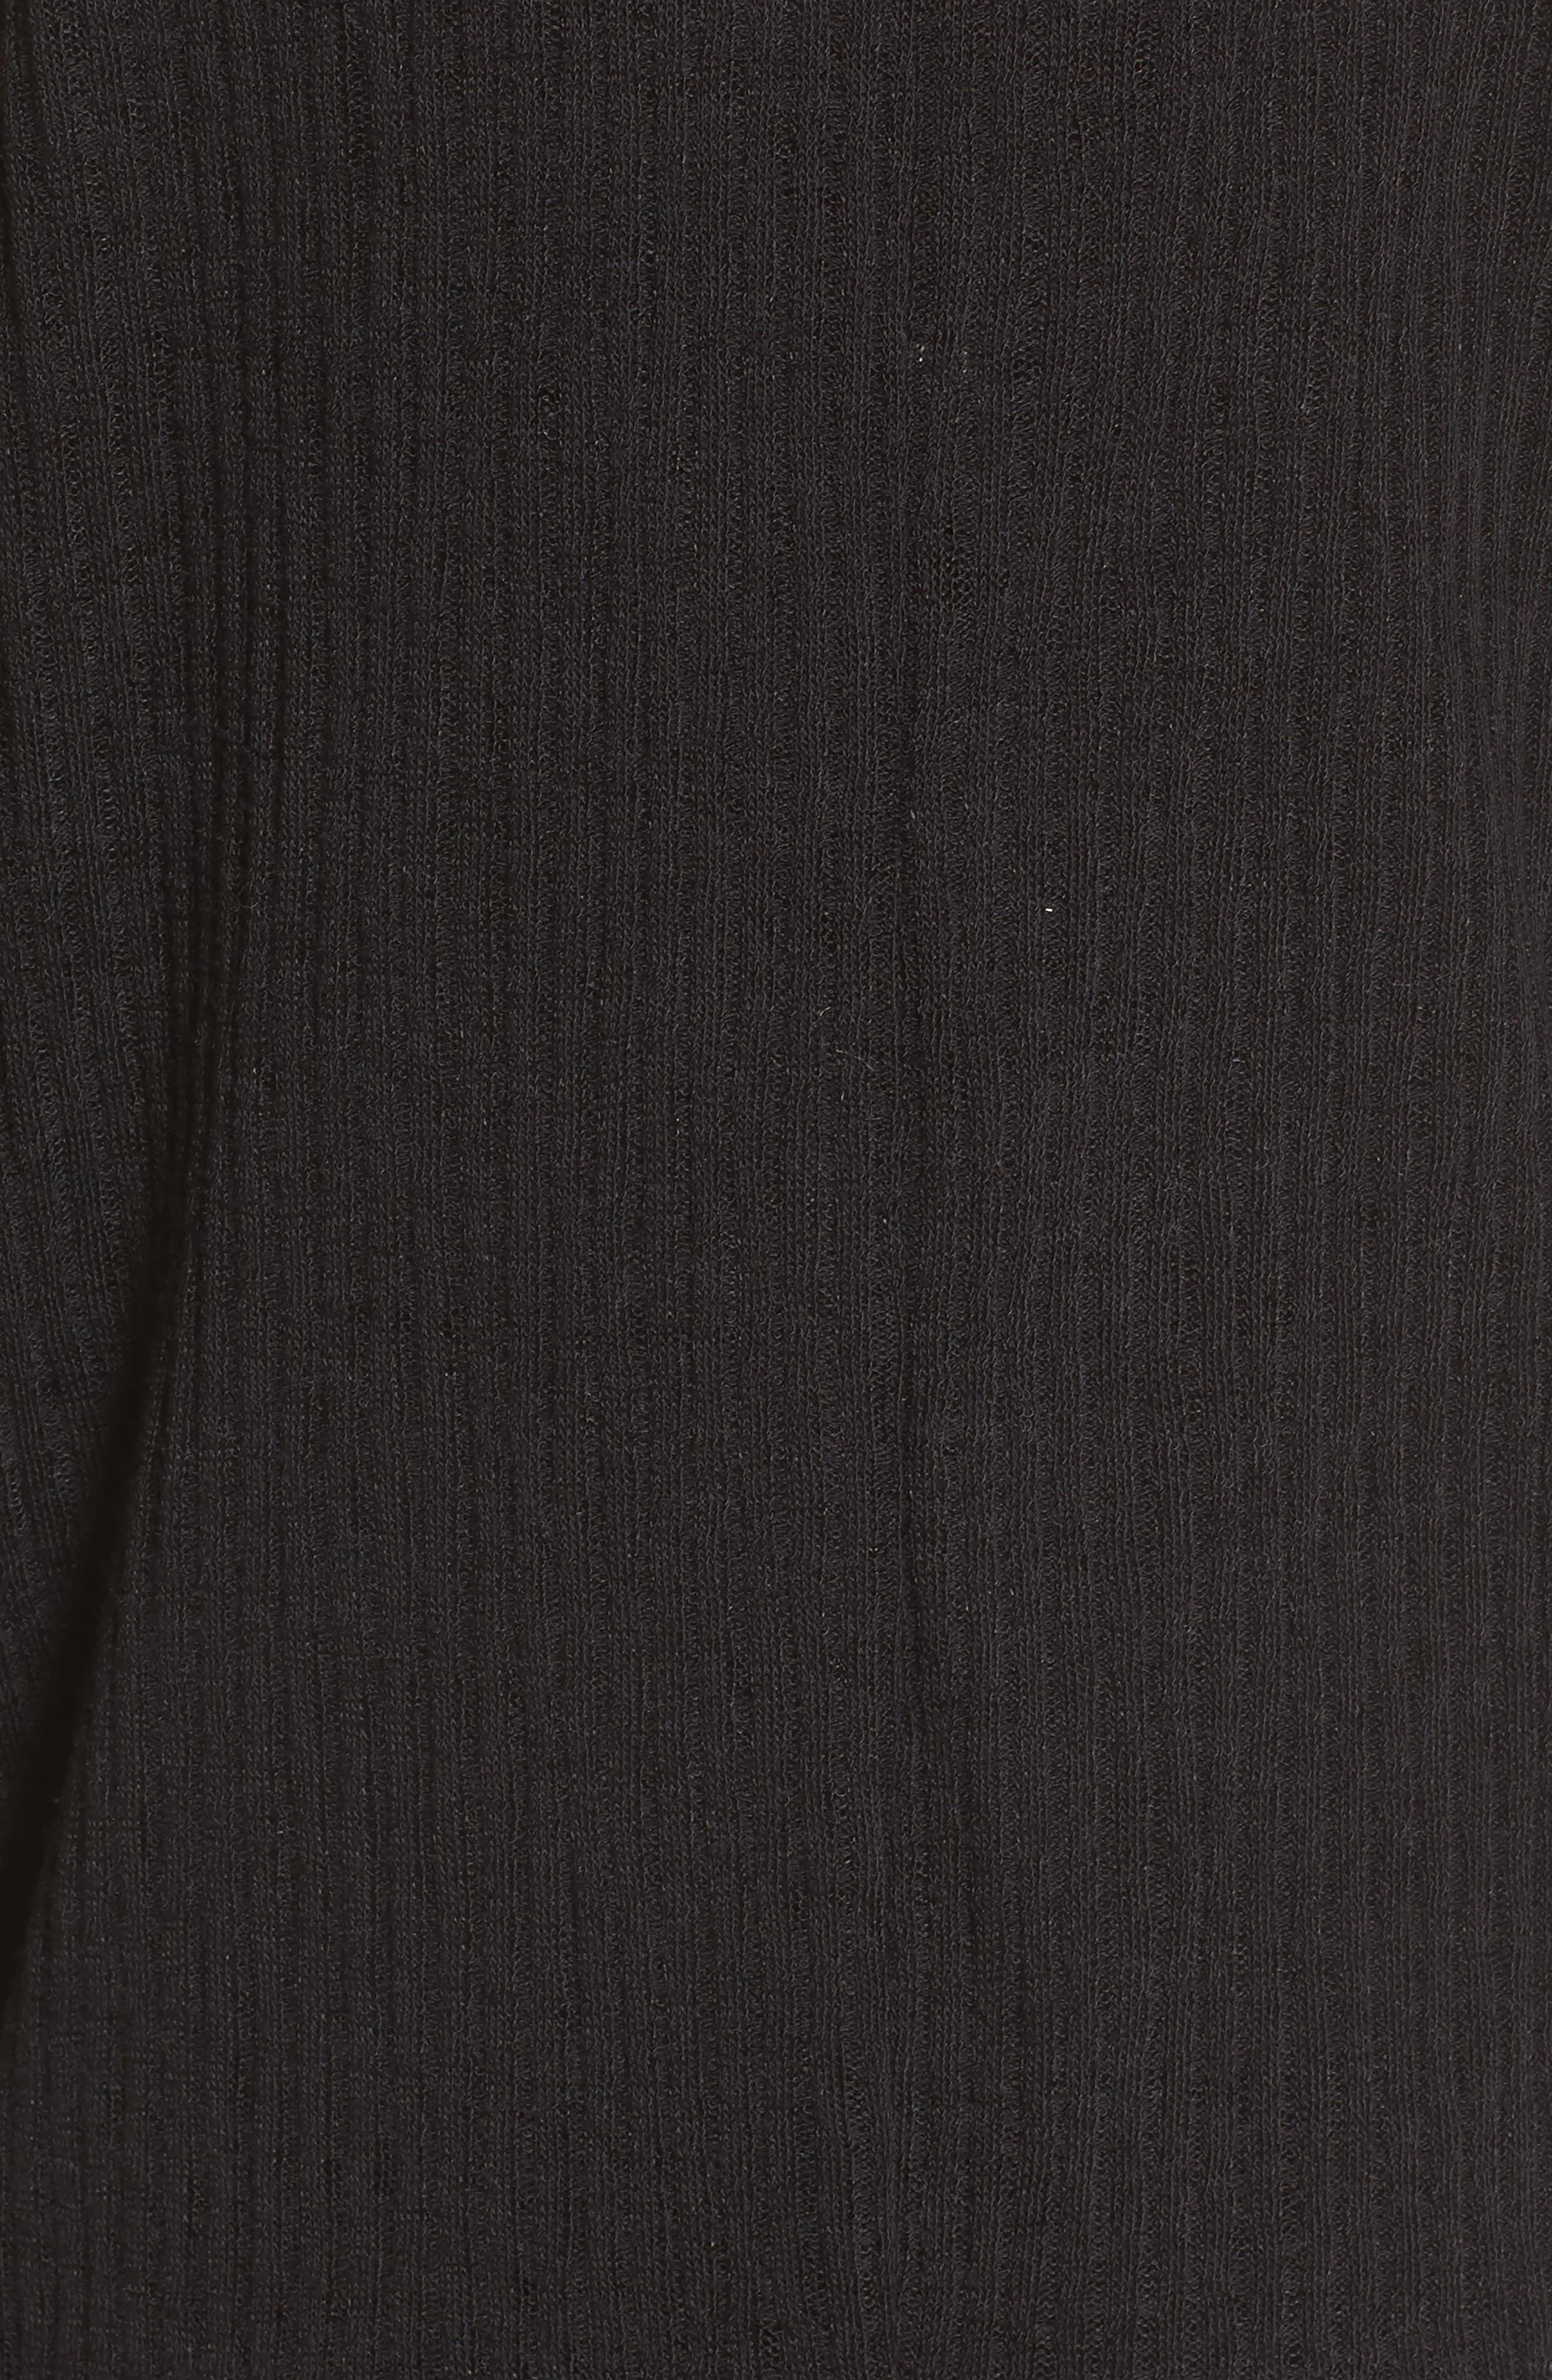 Ribbed Knit Cardigan,                             Alternate thumbnail 5, color,                             001